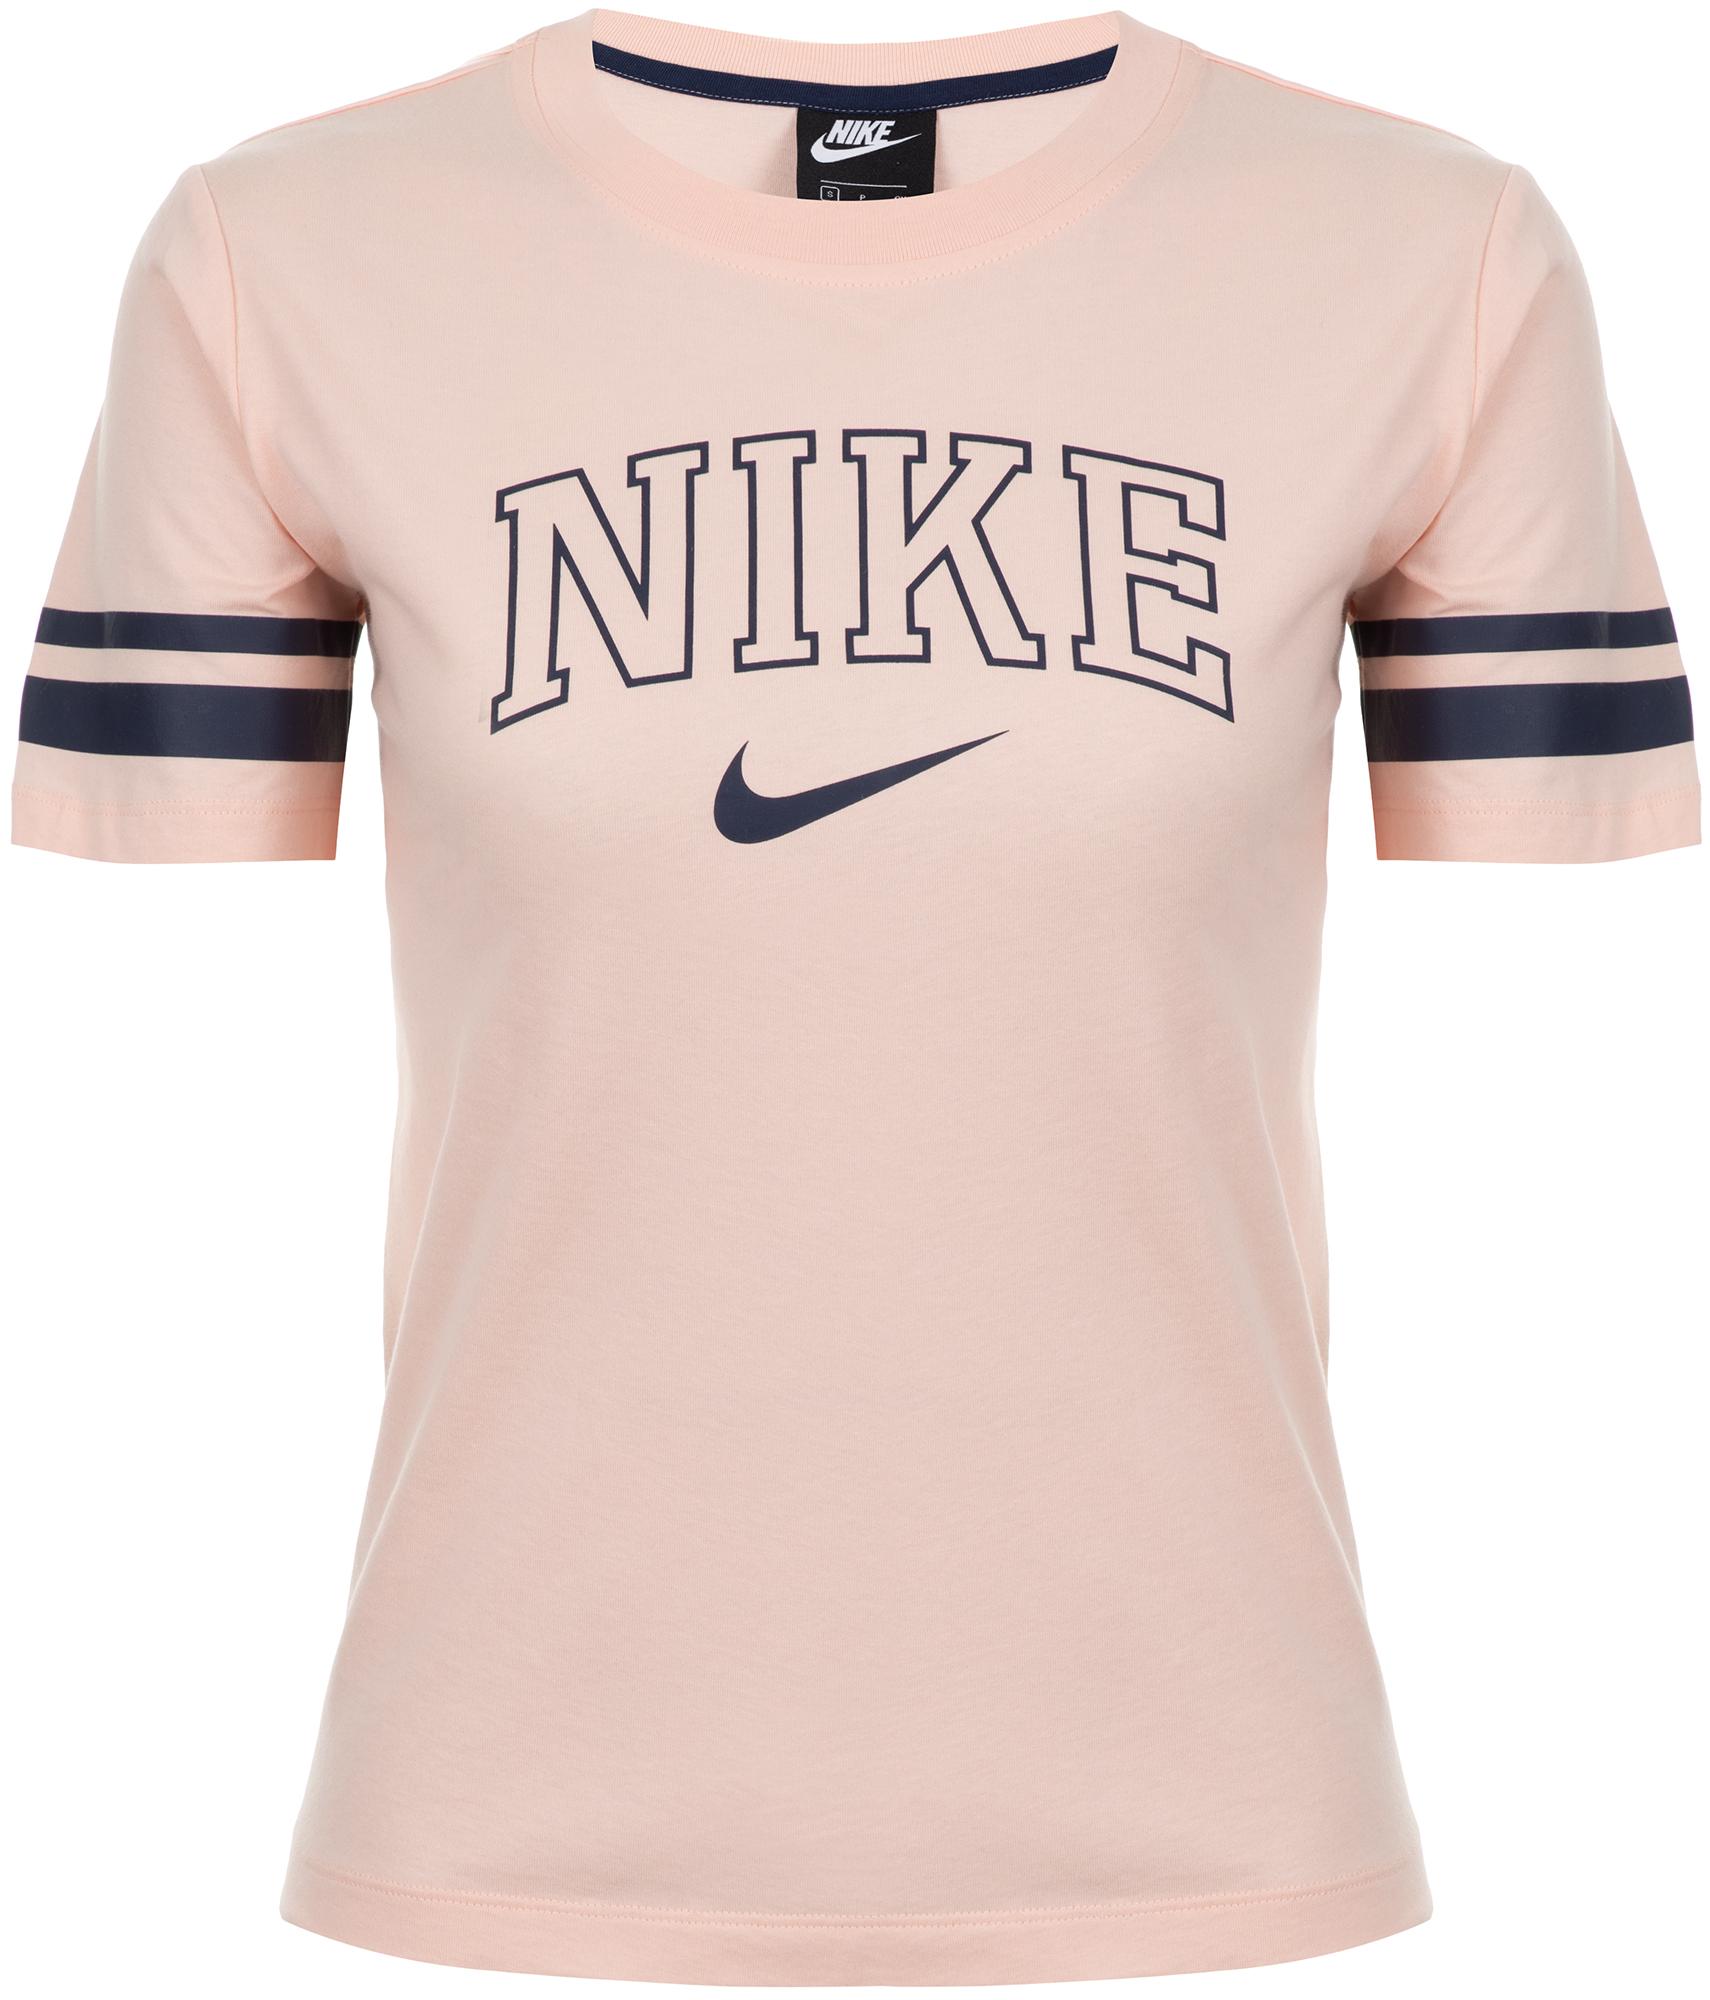 Nike Футболка женская Nike Sportswear, размер 50-52 цена